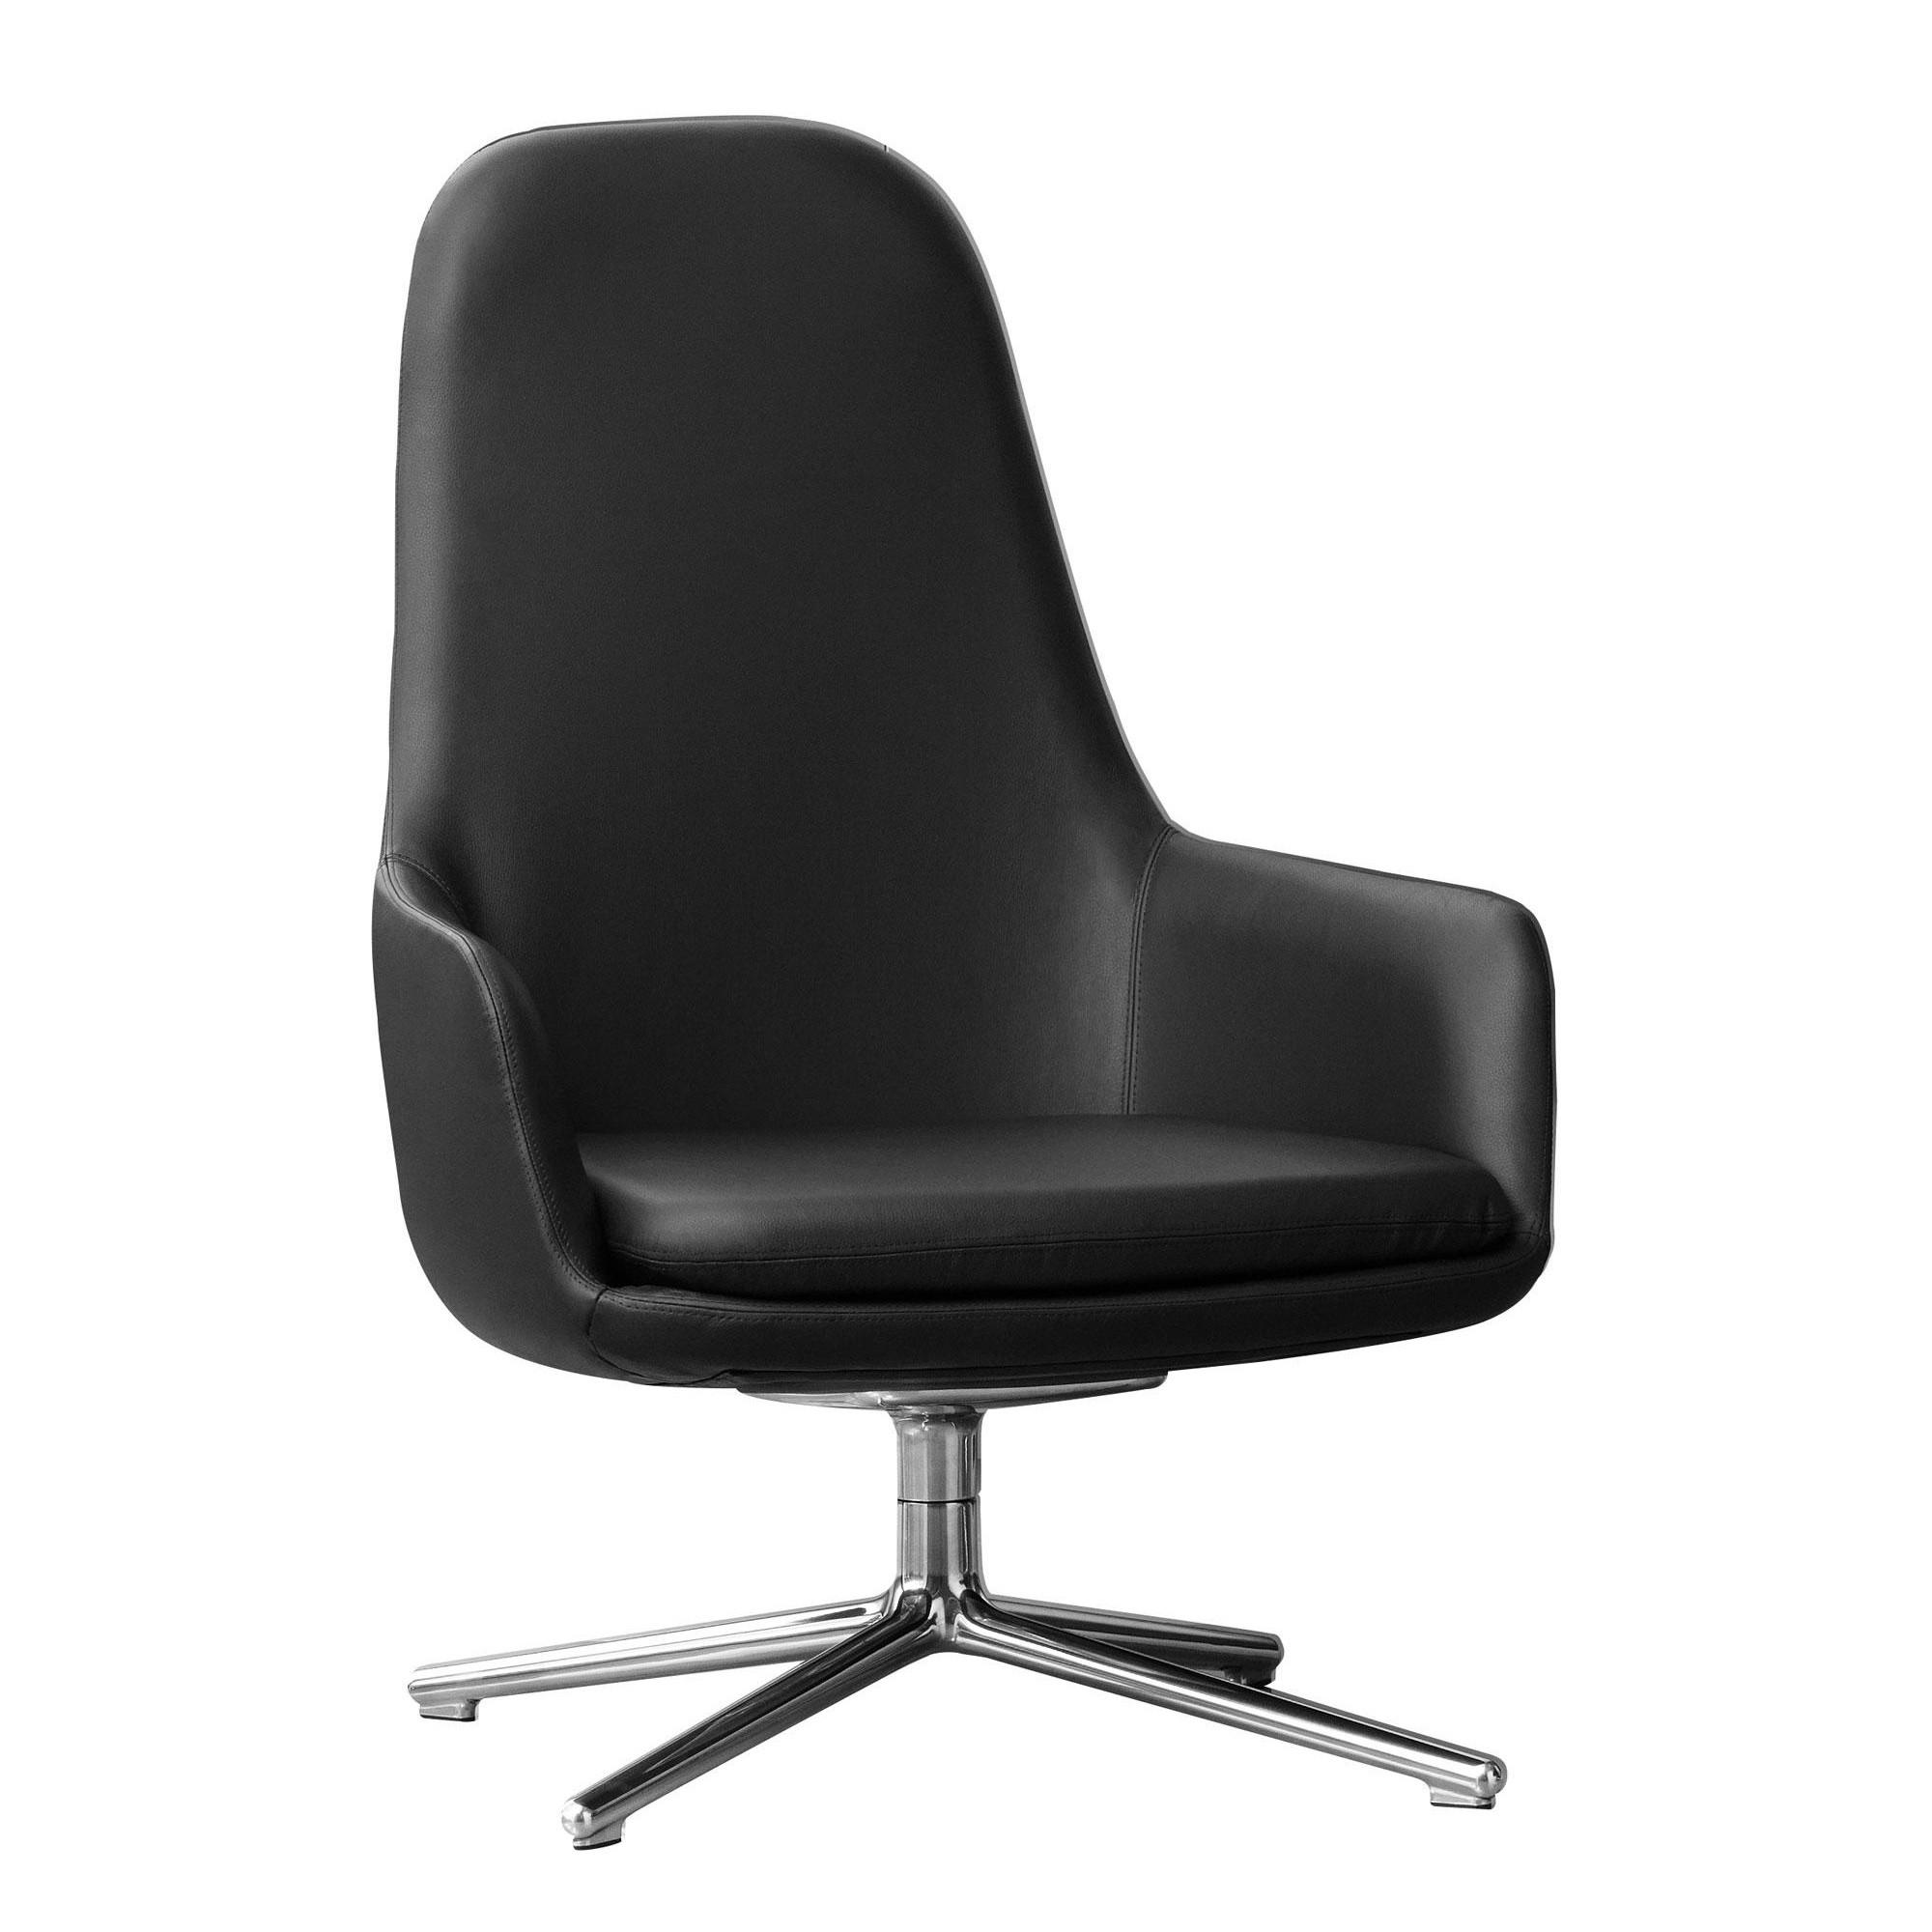 Era Lounge Chair High Swivel Chair Leather